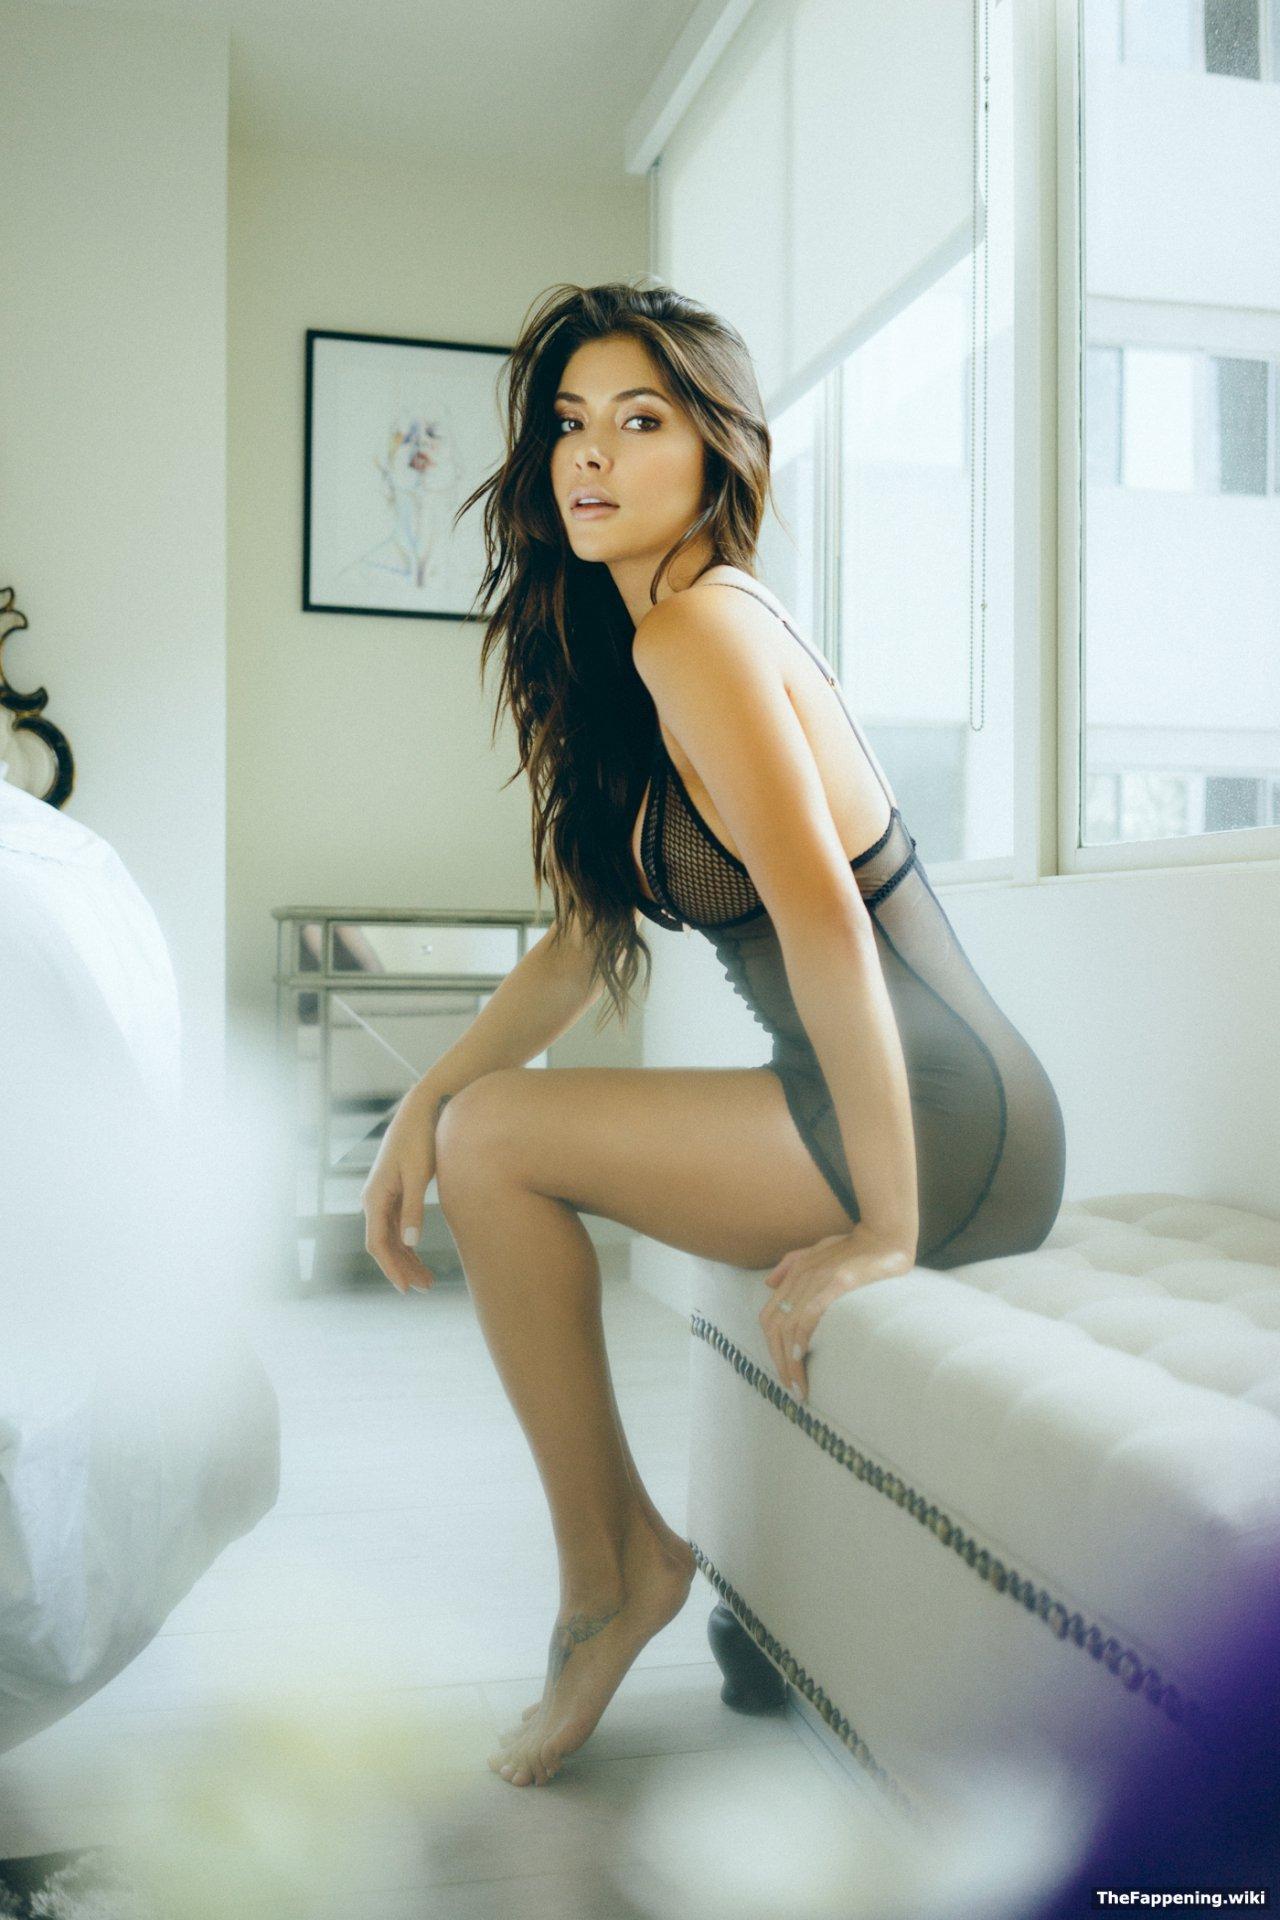 ELISE: Arianny celeste free nude